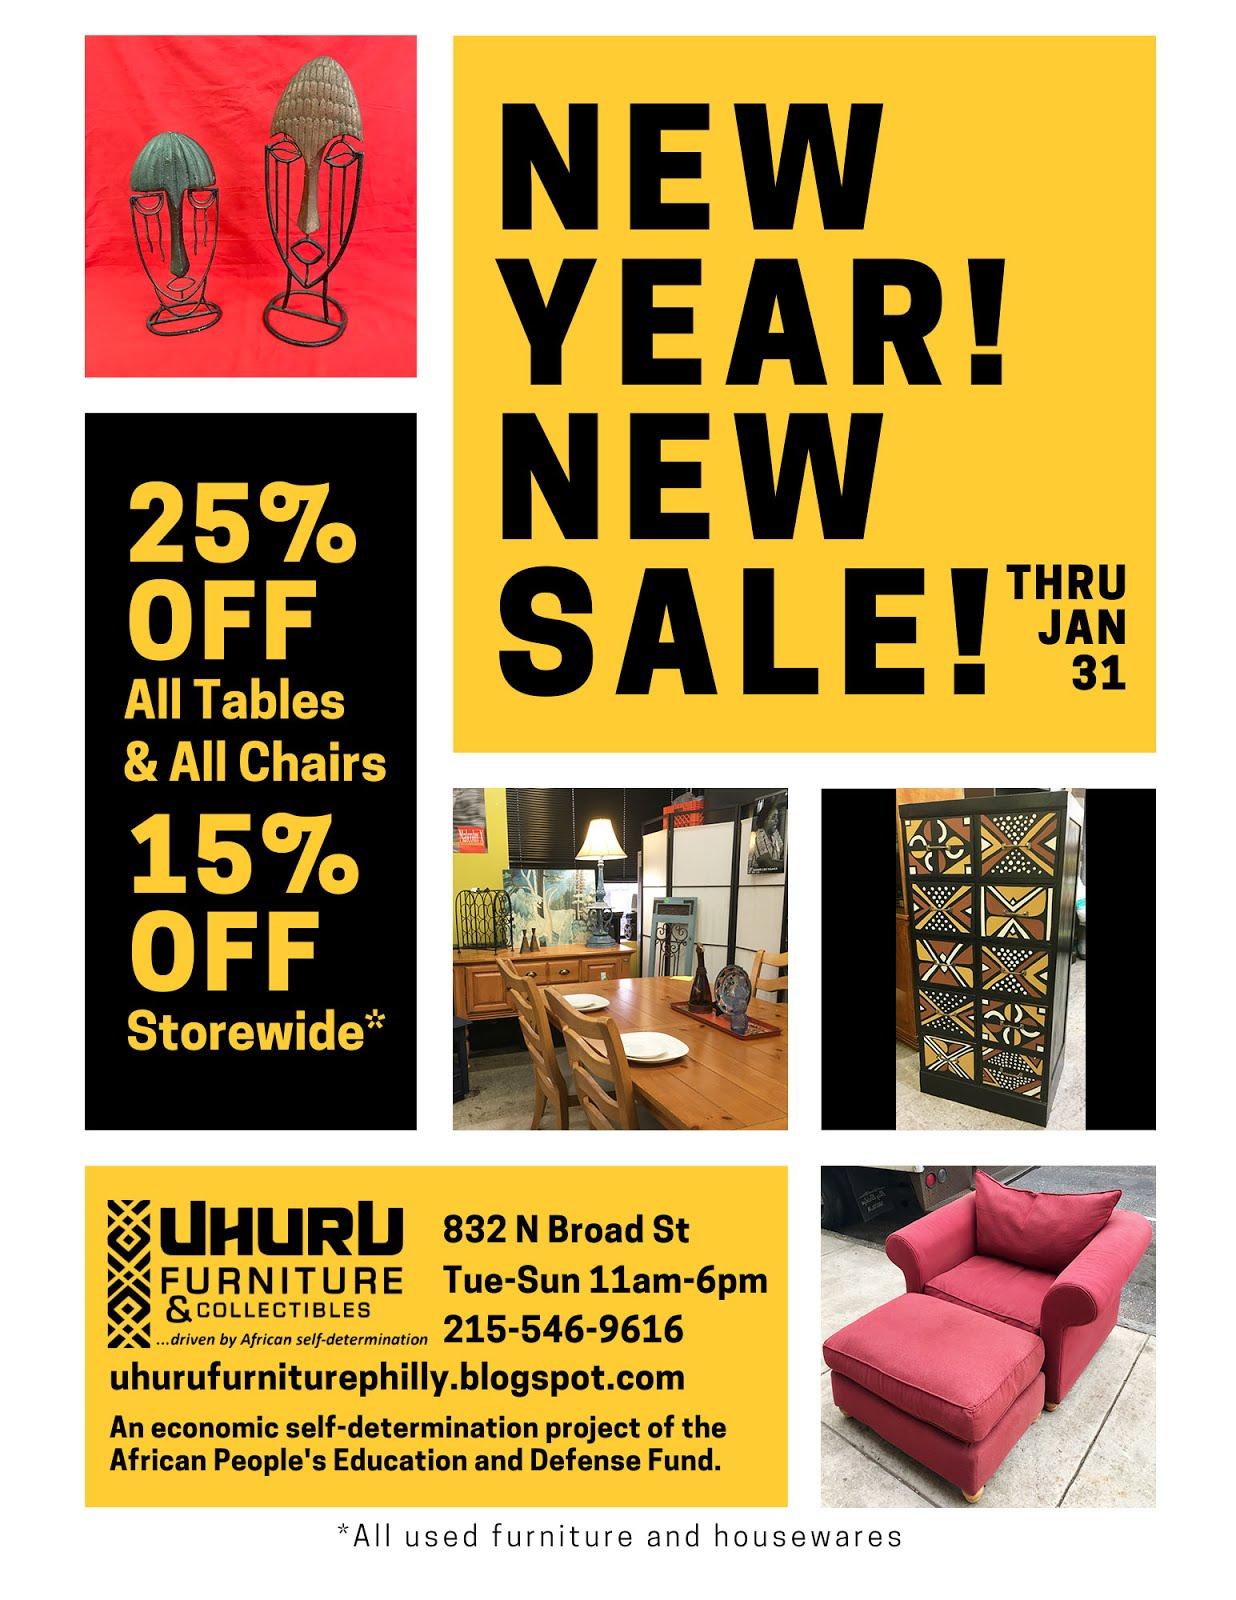 This month at Uhuru Furniture: